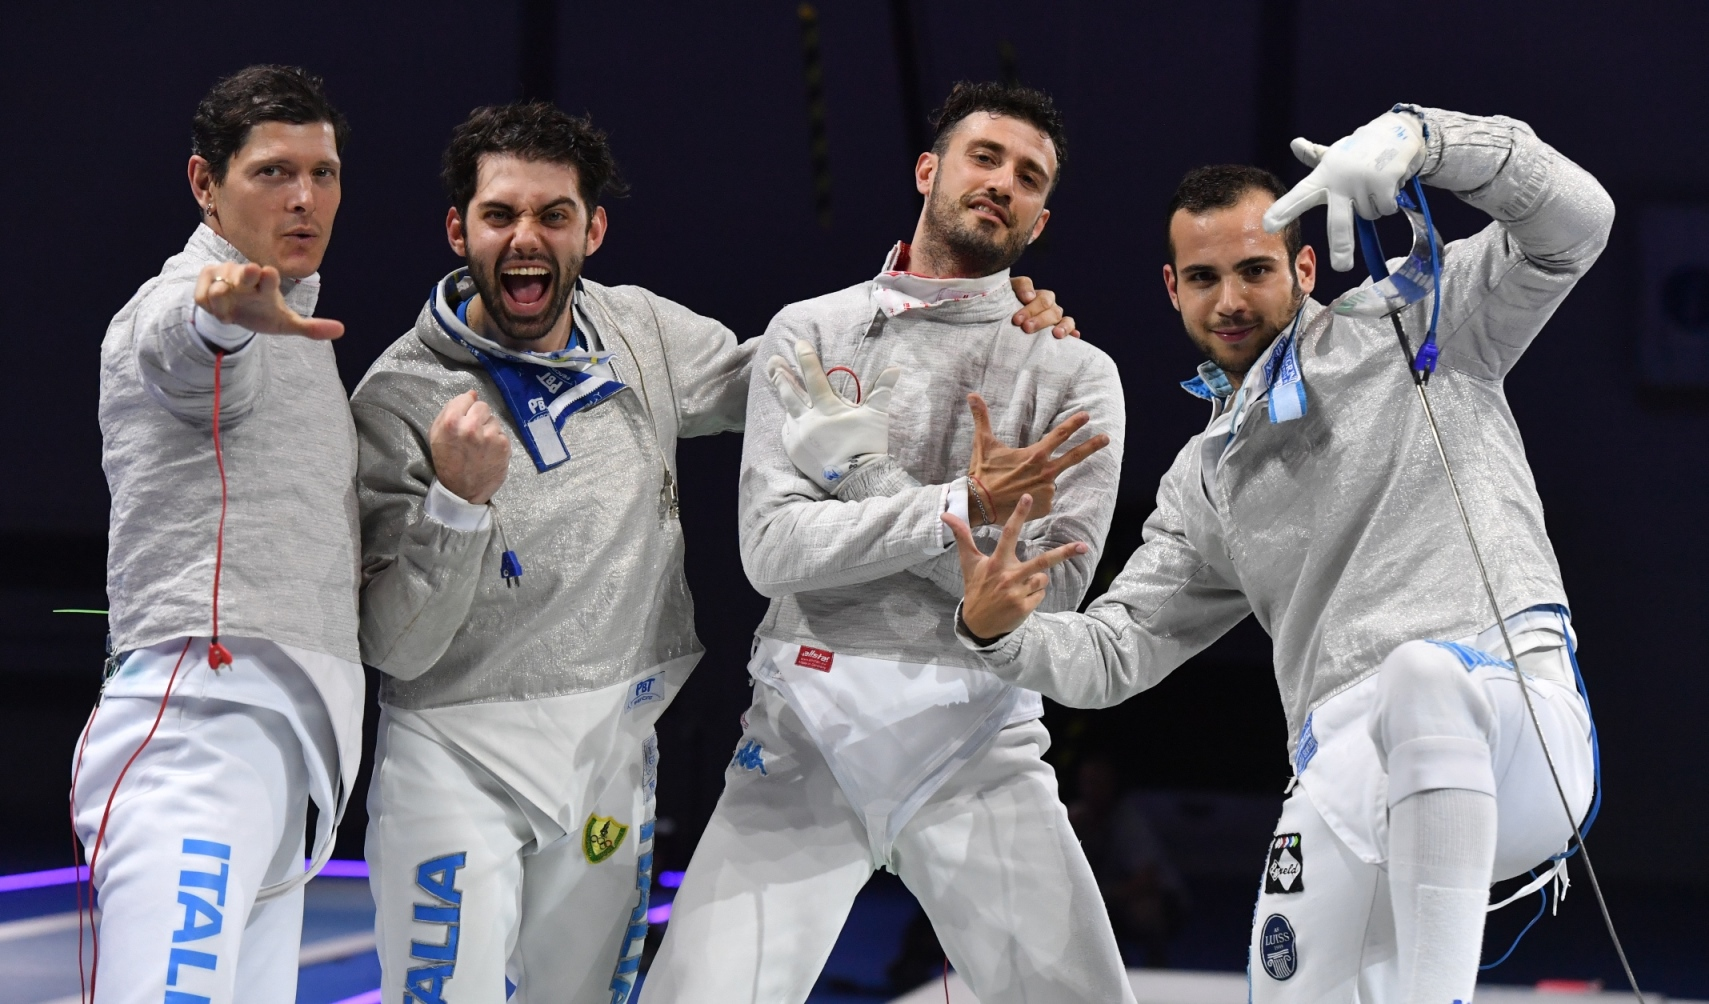 Scherma, Europei Dusseldorf 2019: l'Italia chiude con dieci medaglie